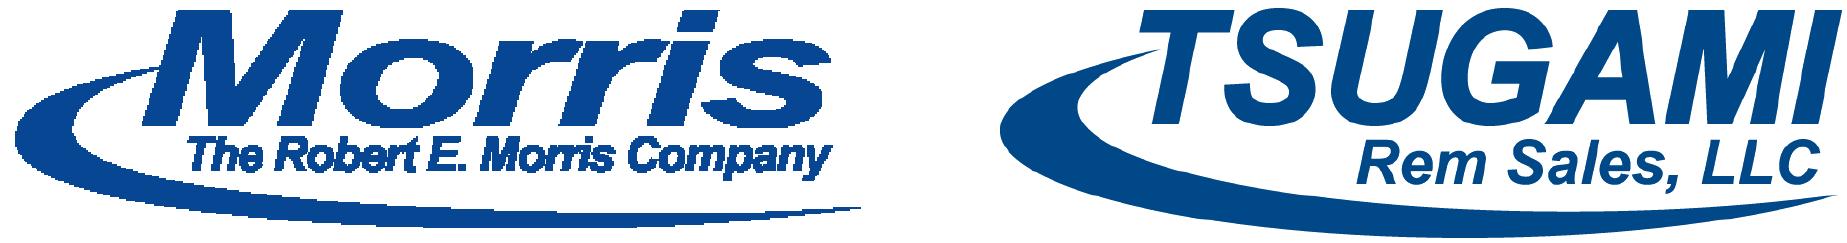 REMCO Tsugami logos